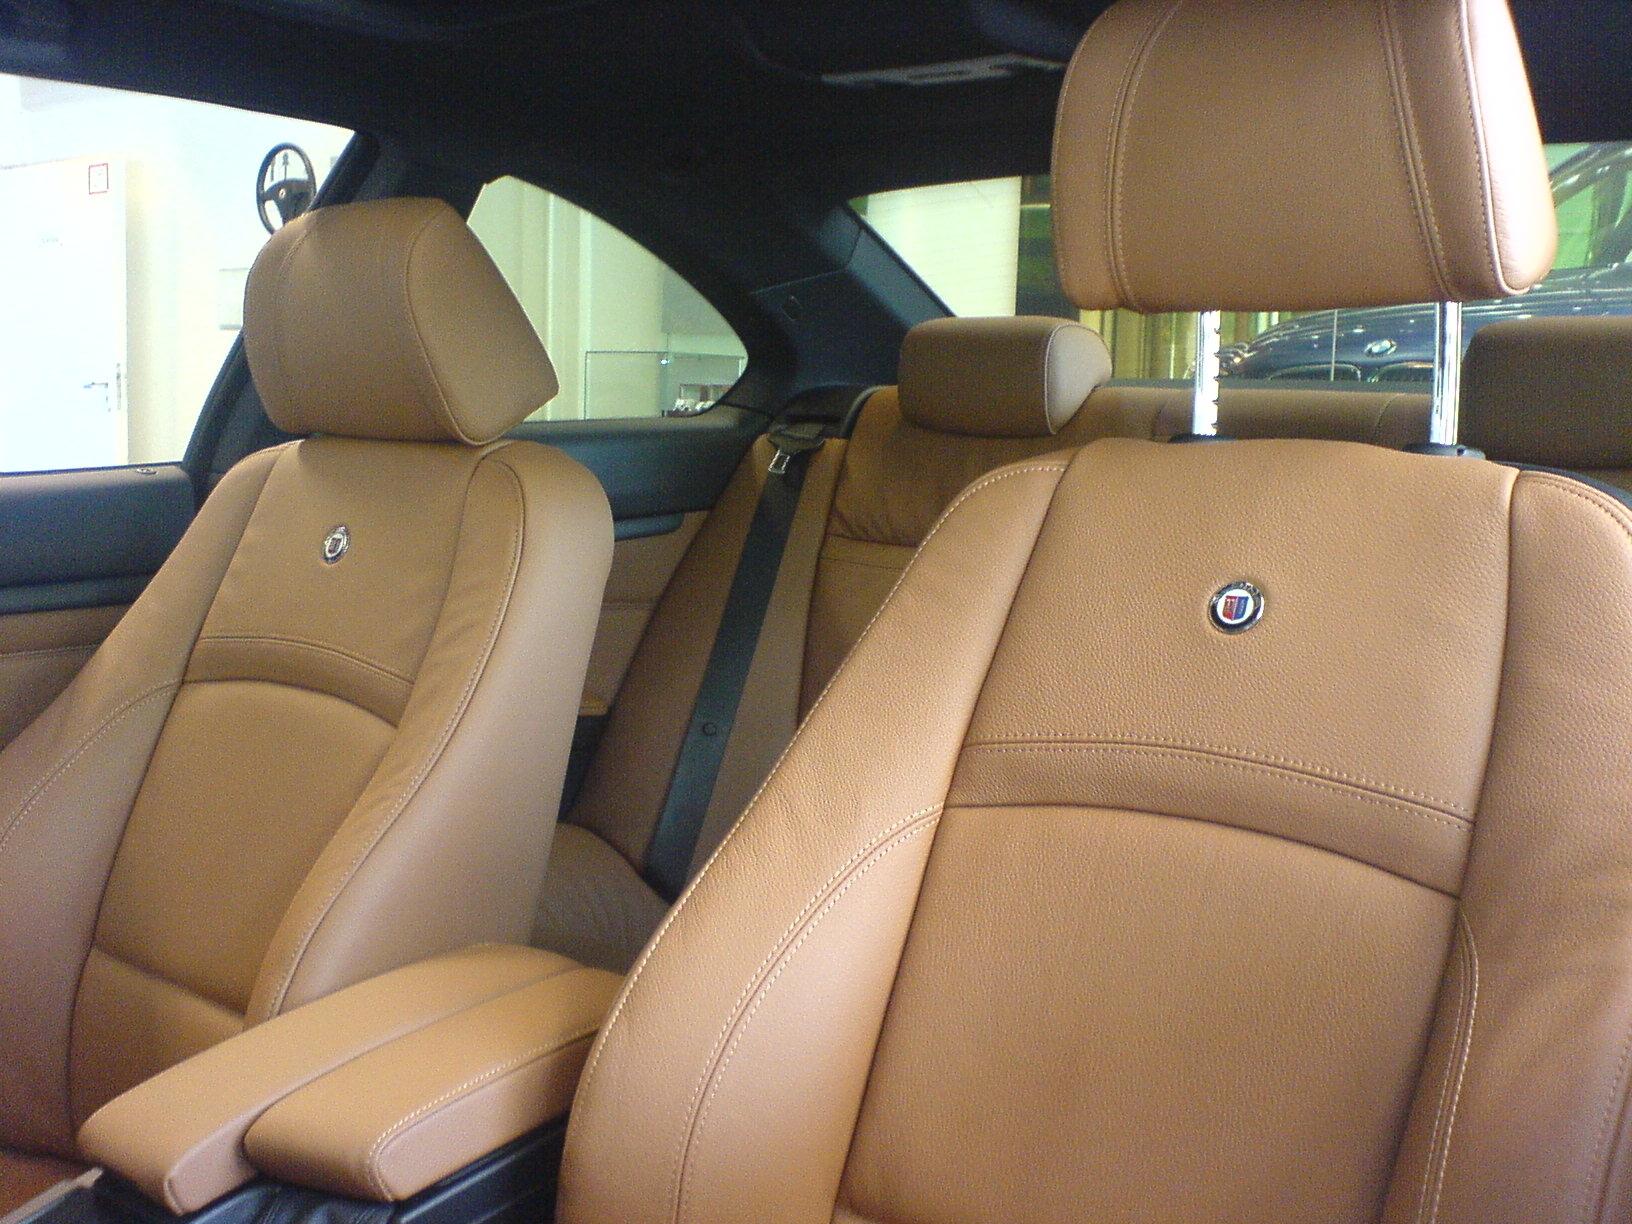 Dale's Auto Upholstery Centre in Medicine Hat: BMW auto seats